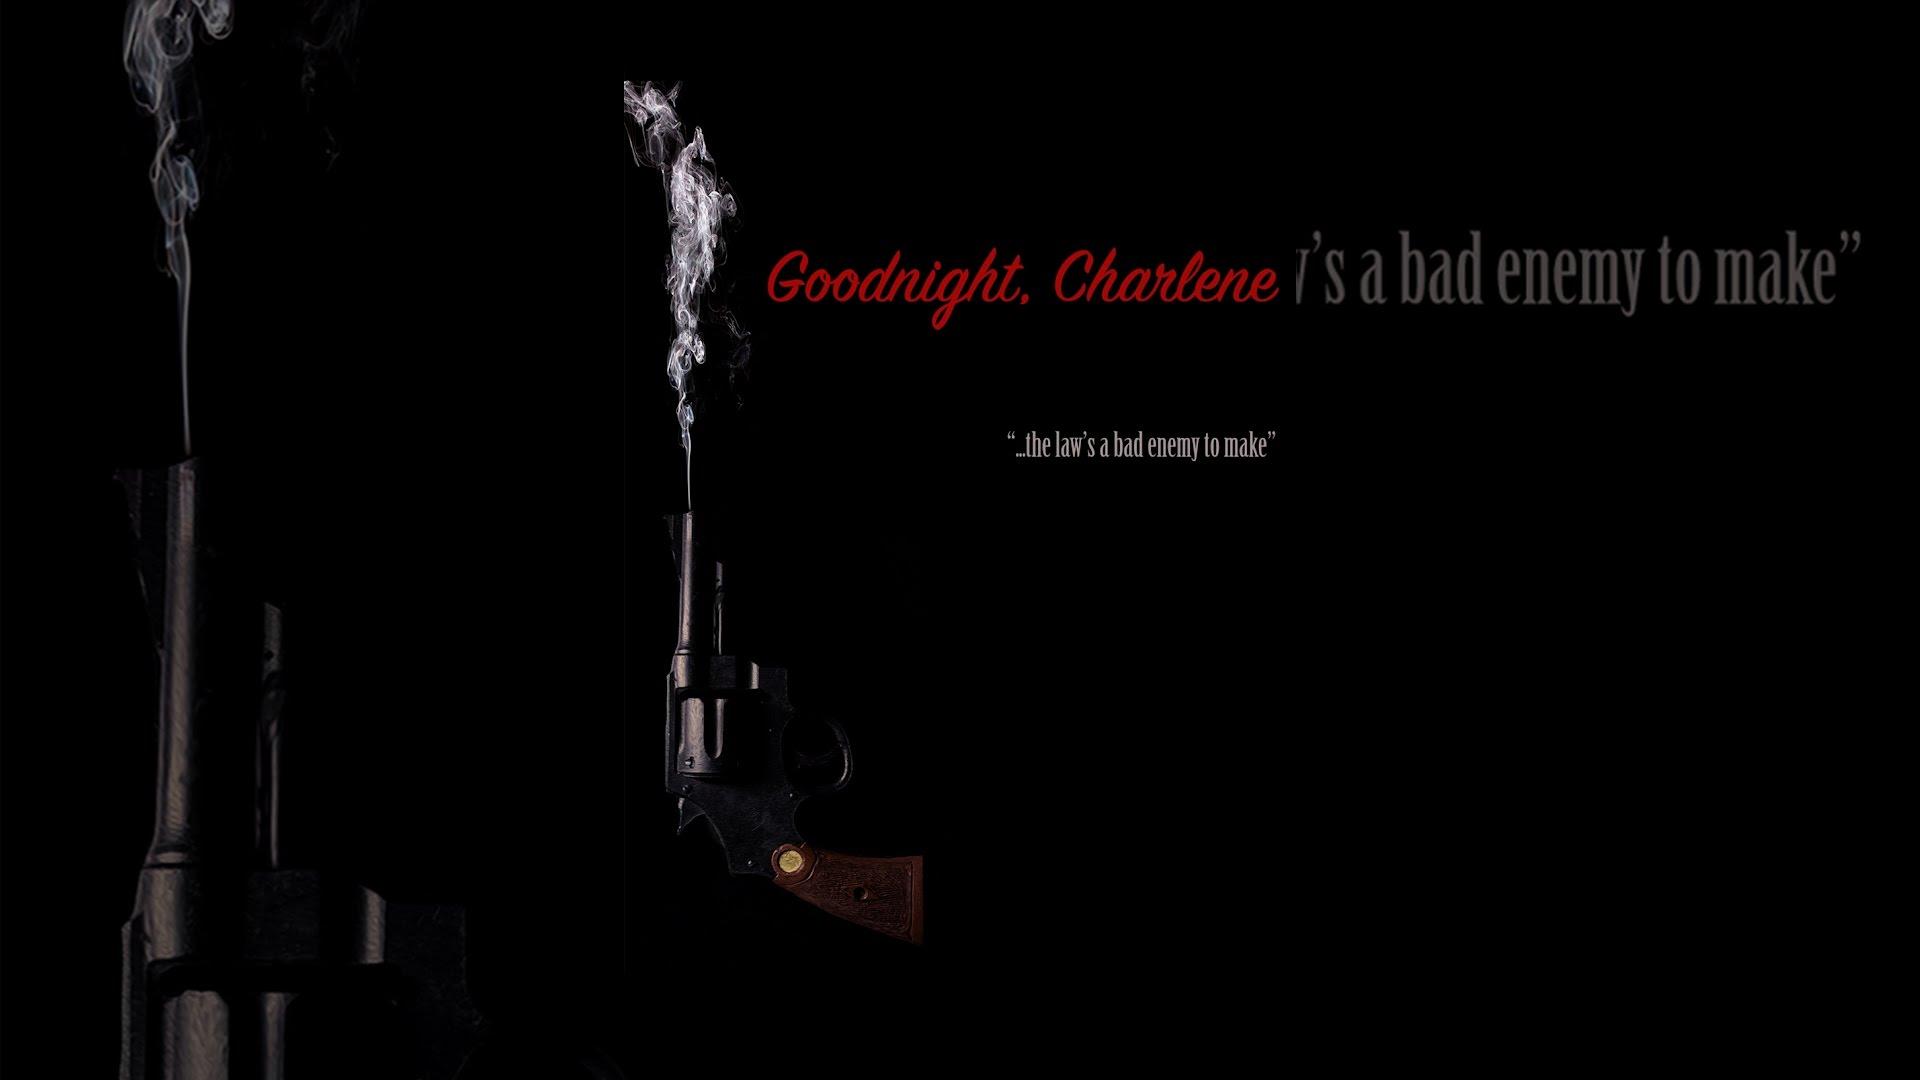 [VIDEO] - Goodnight, Charlene 2